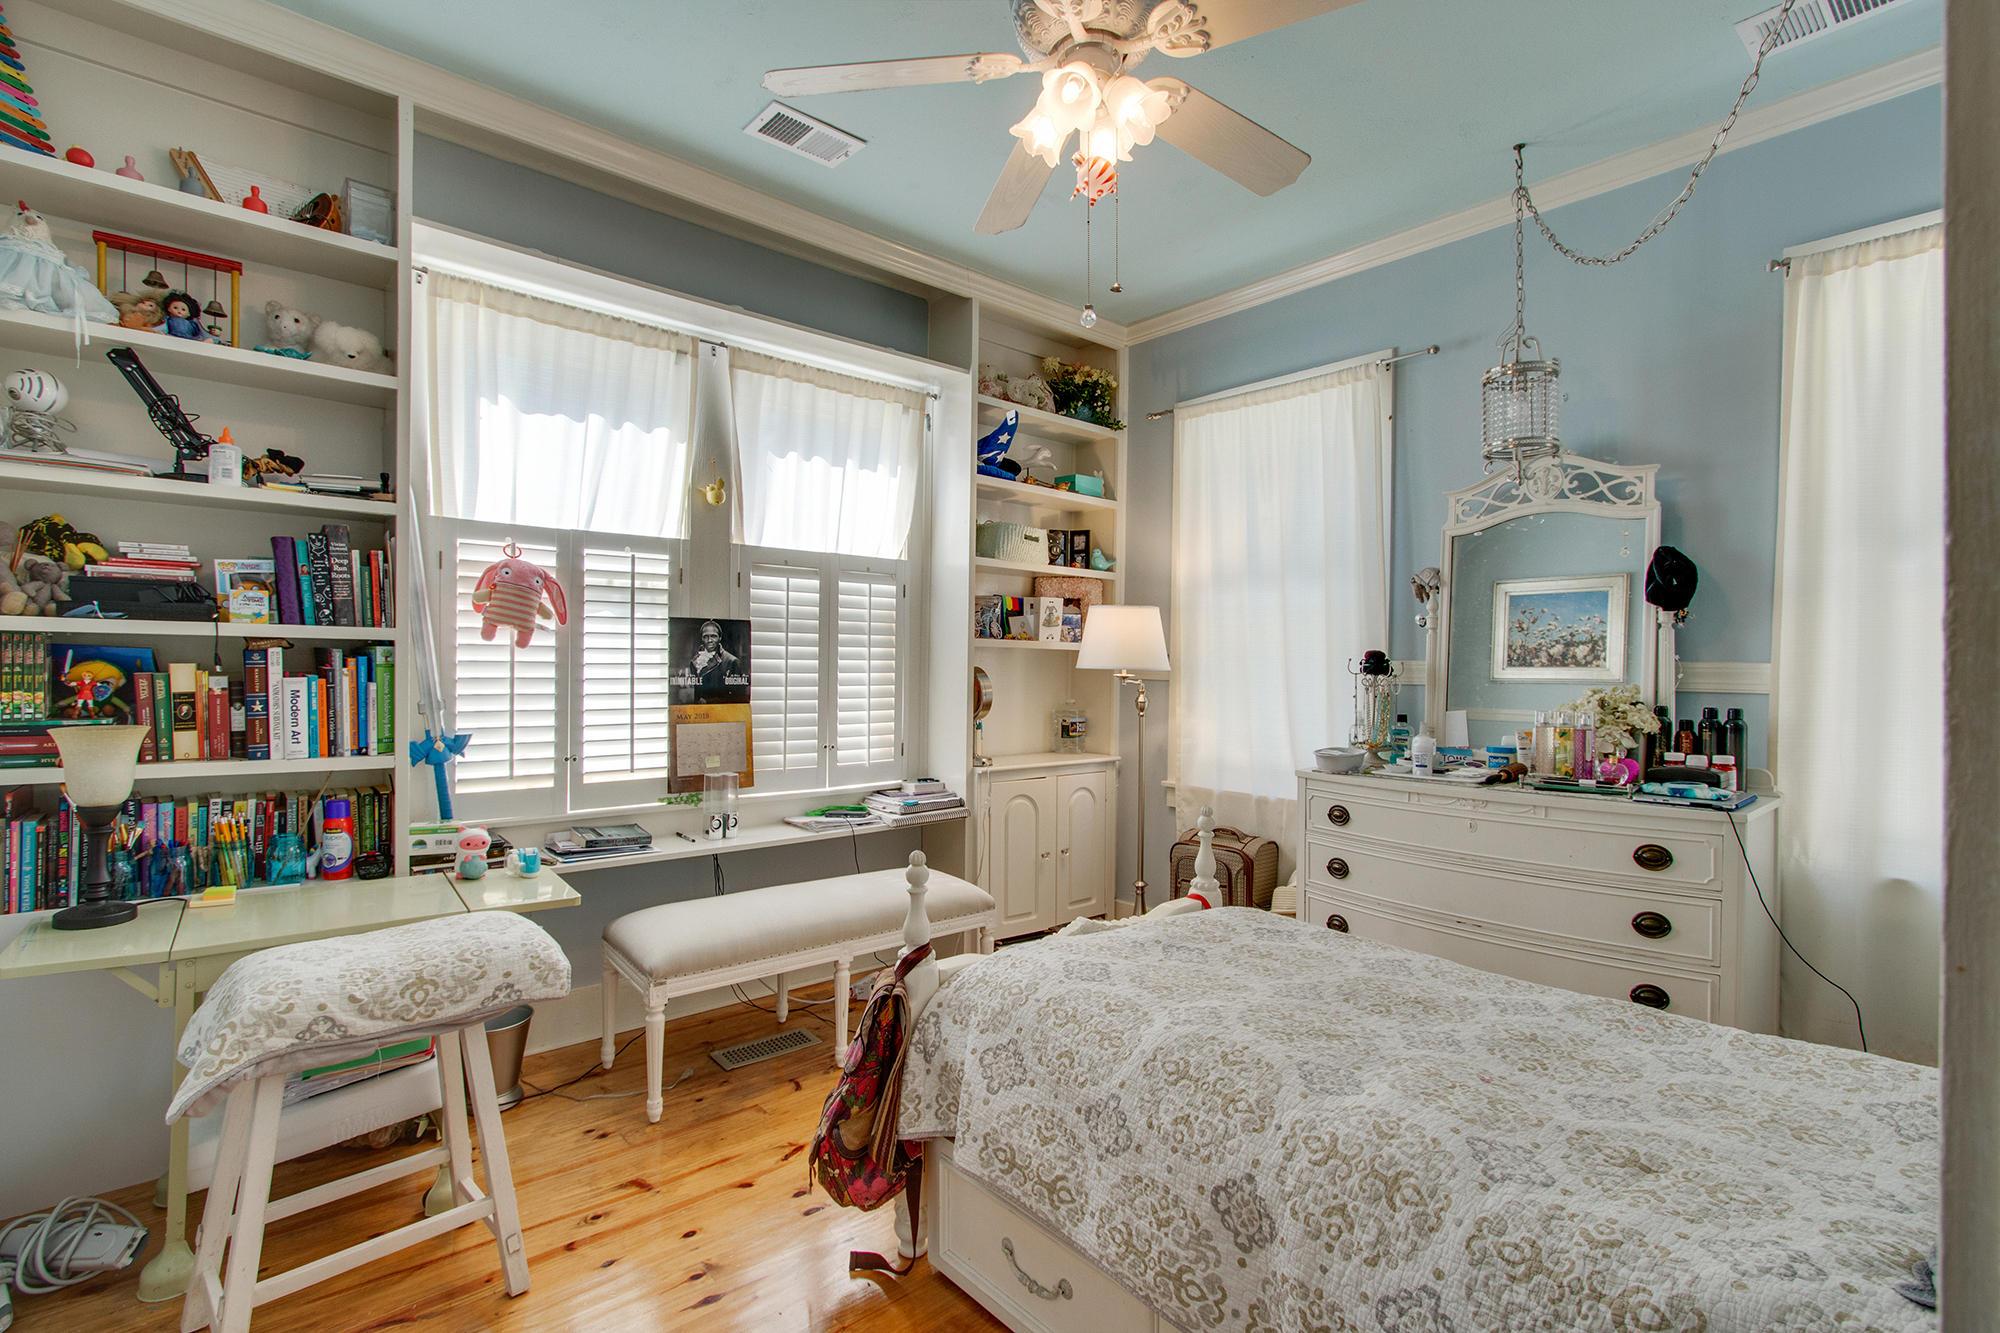 Historic District Homes For Sale - 308 Pine, Summerville, SC - 11